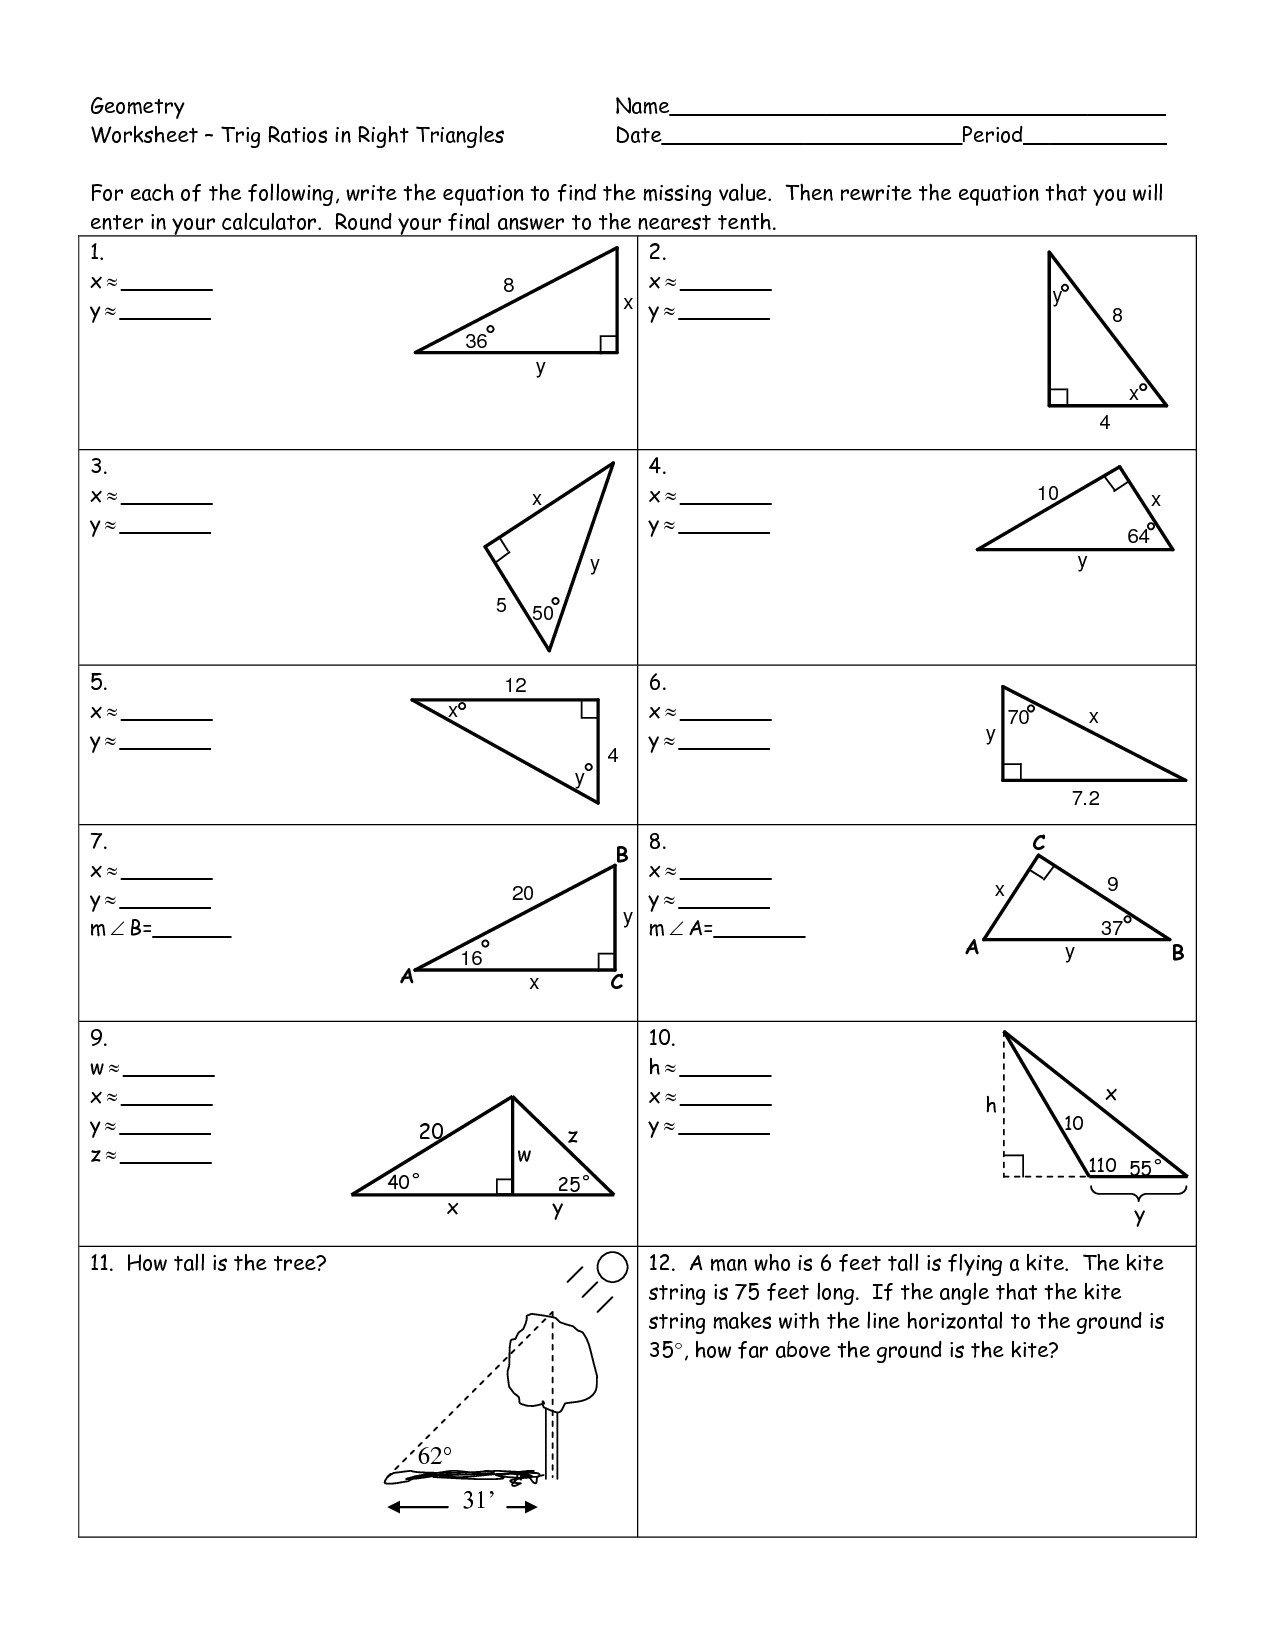 Brilliant Ideas Of Trigonometric Ratios Worksheet Answers Unique Intended For Trigonometric Ratios Worksheet